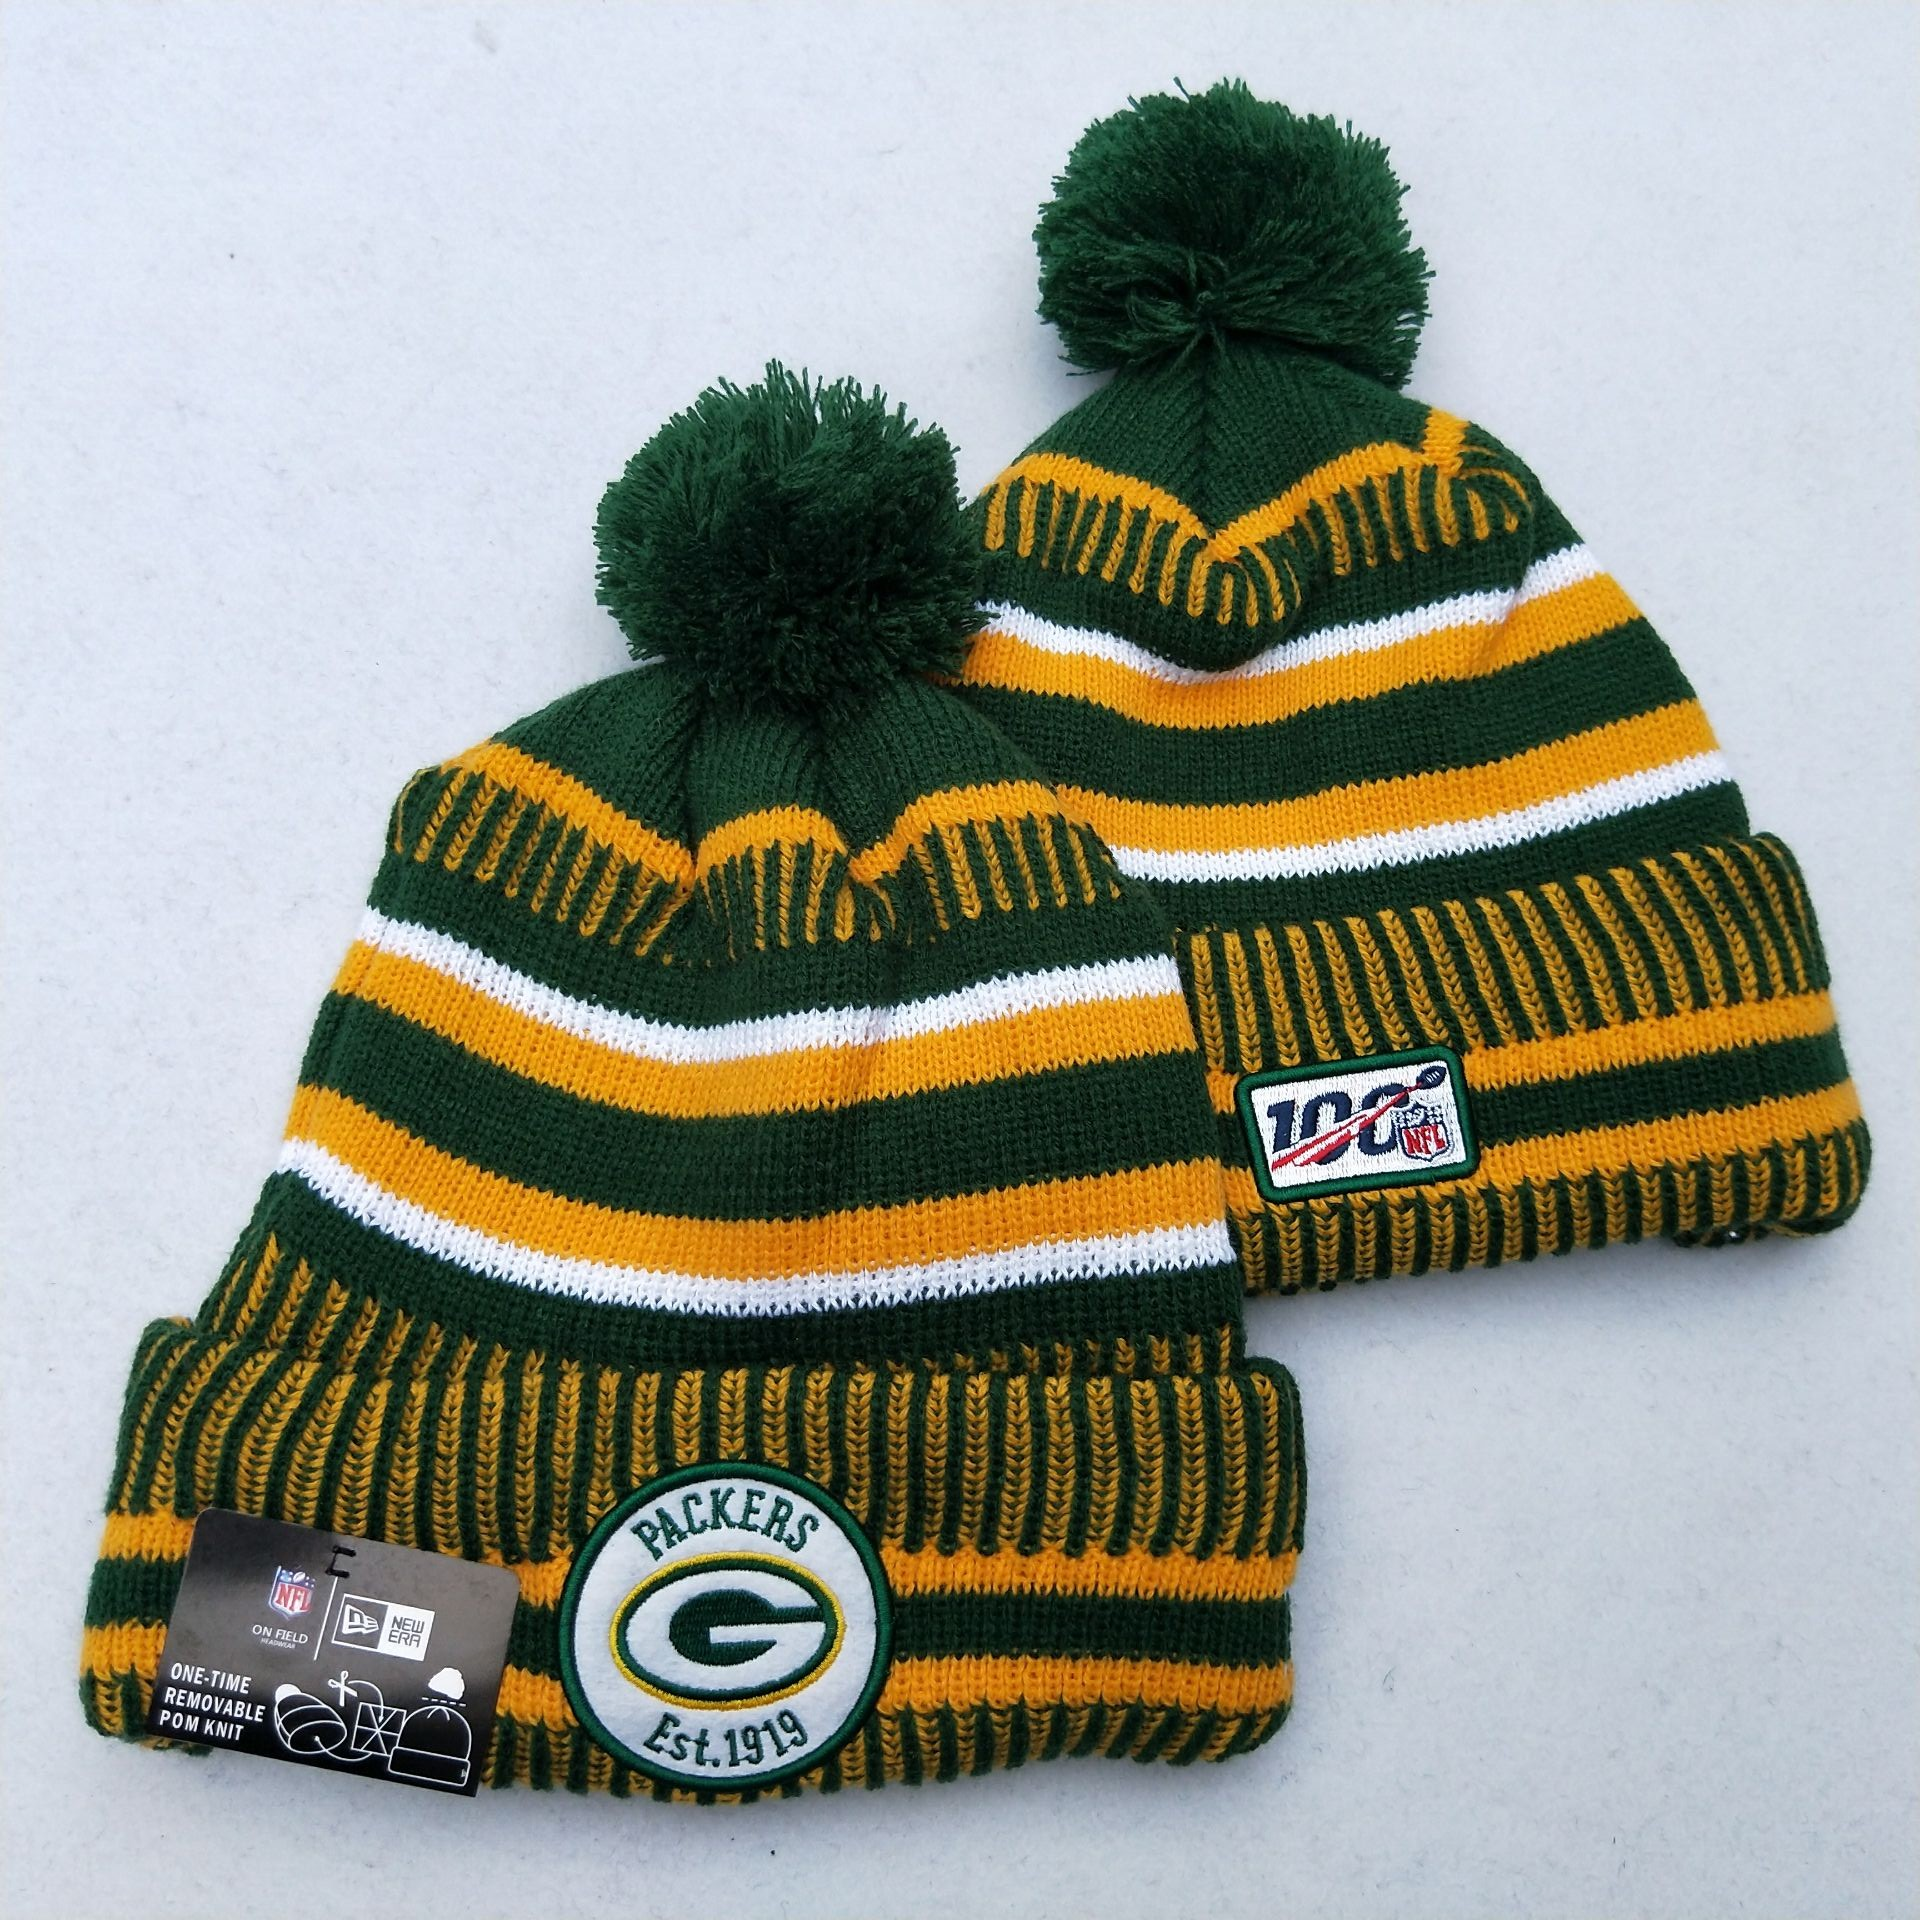 Packers Team Logo Green Yellow 100th Season Pom Knit Hat YD